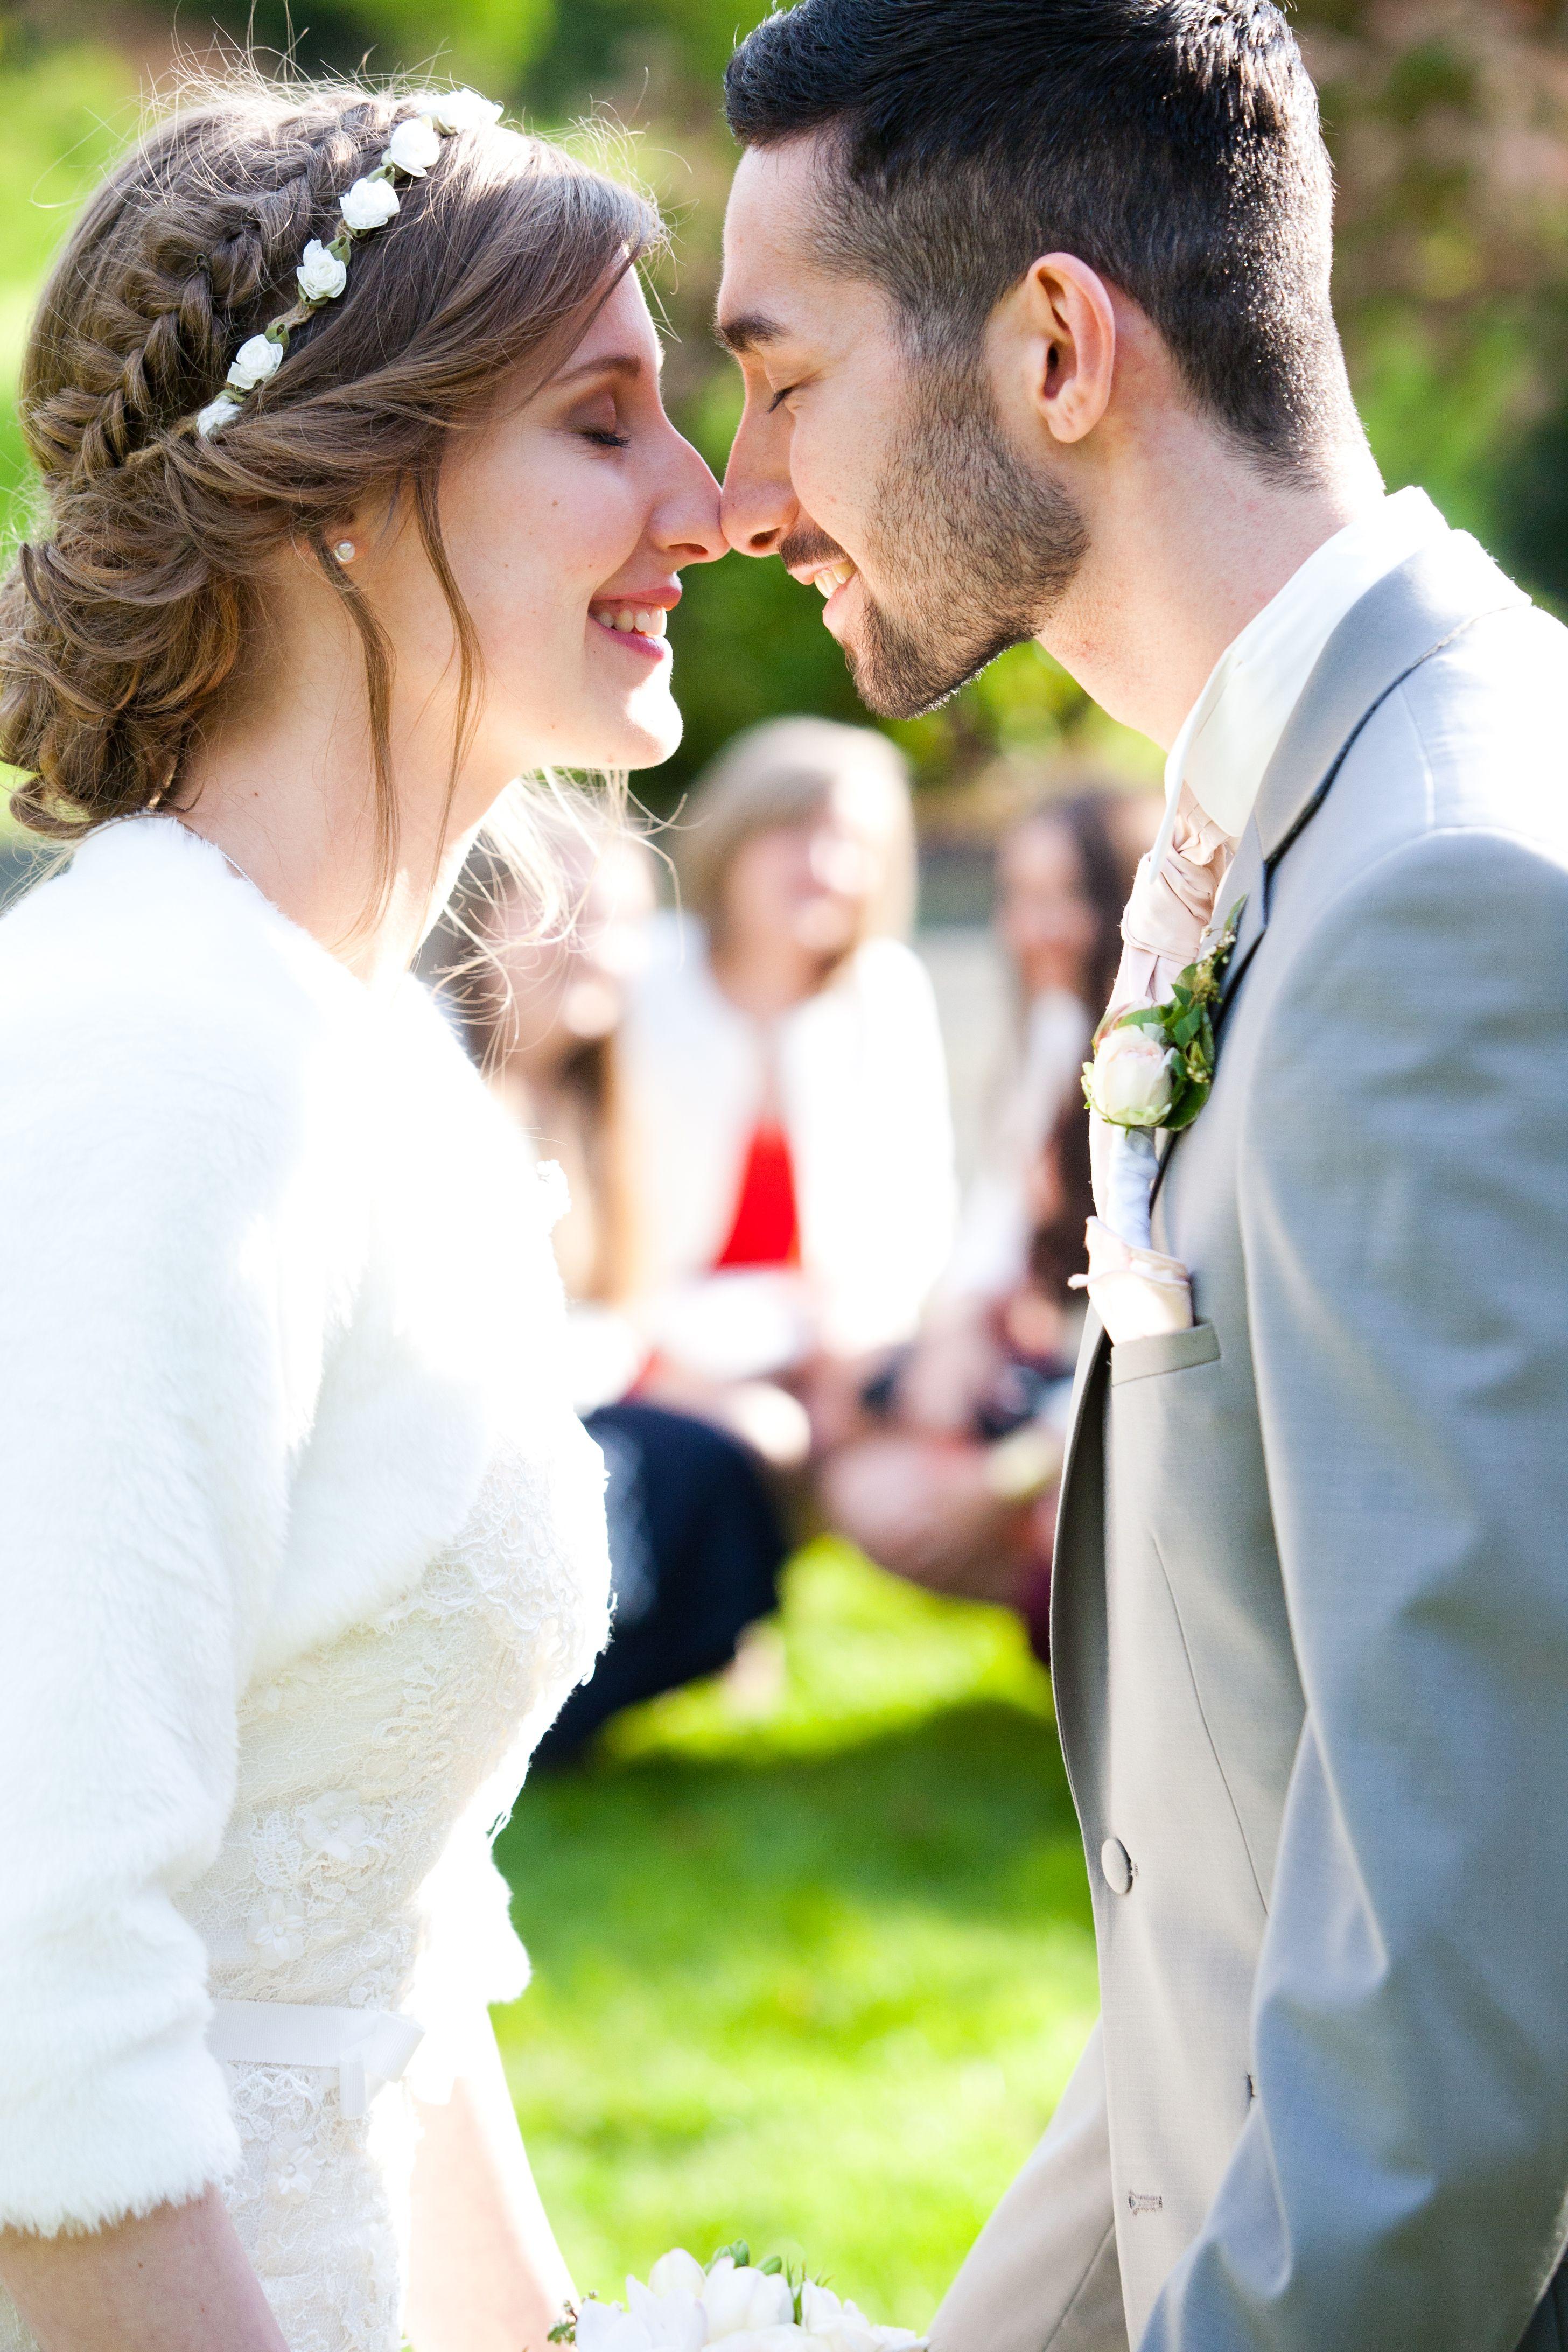 Coiffure de mariée Tresses, chignon bohème, headband